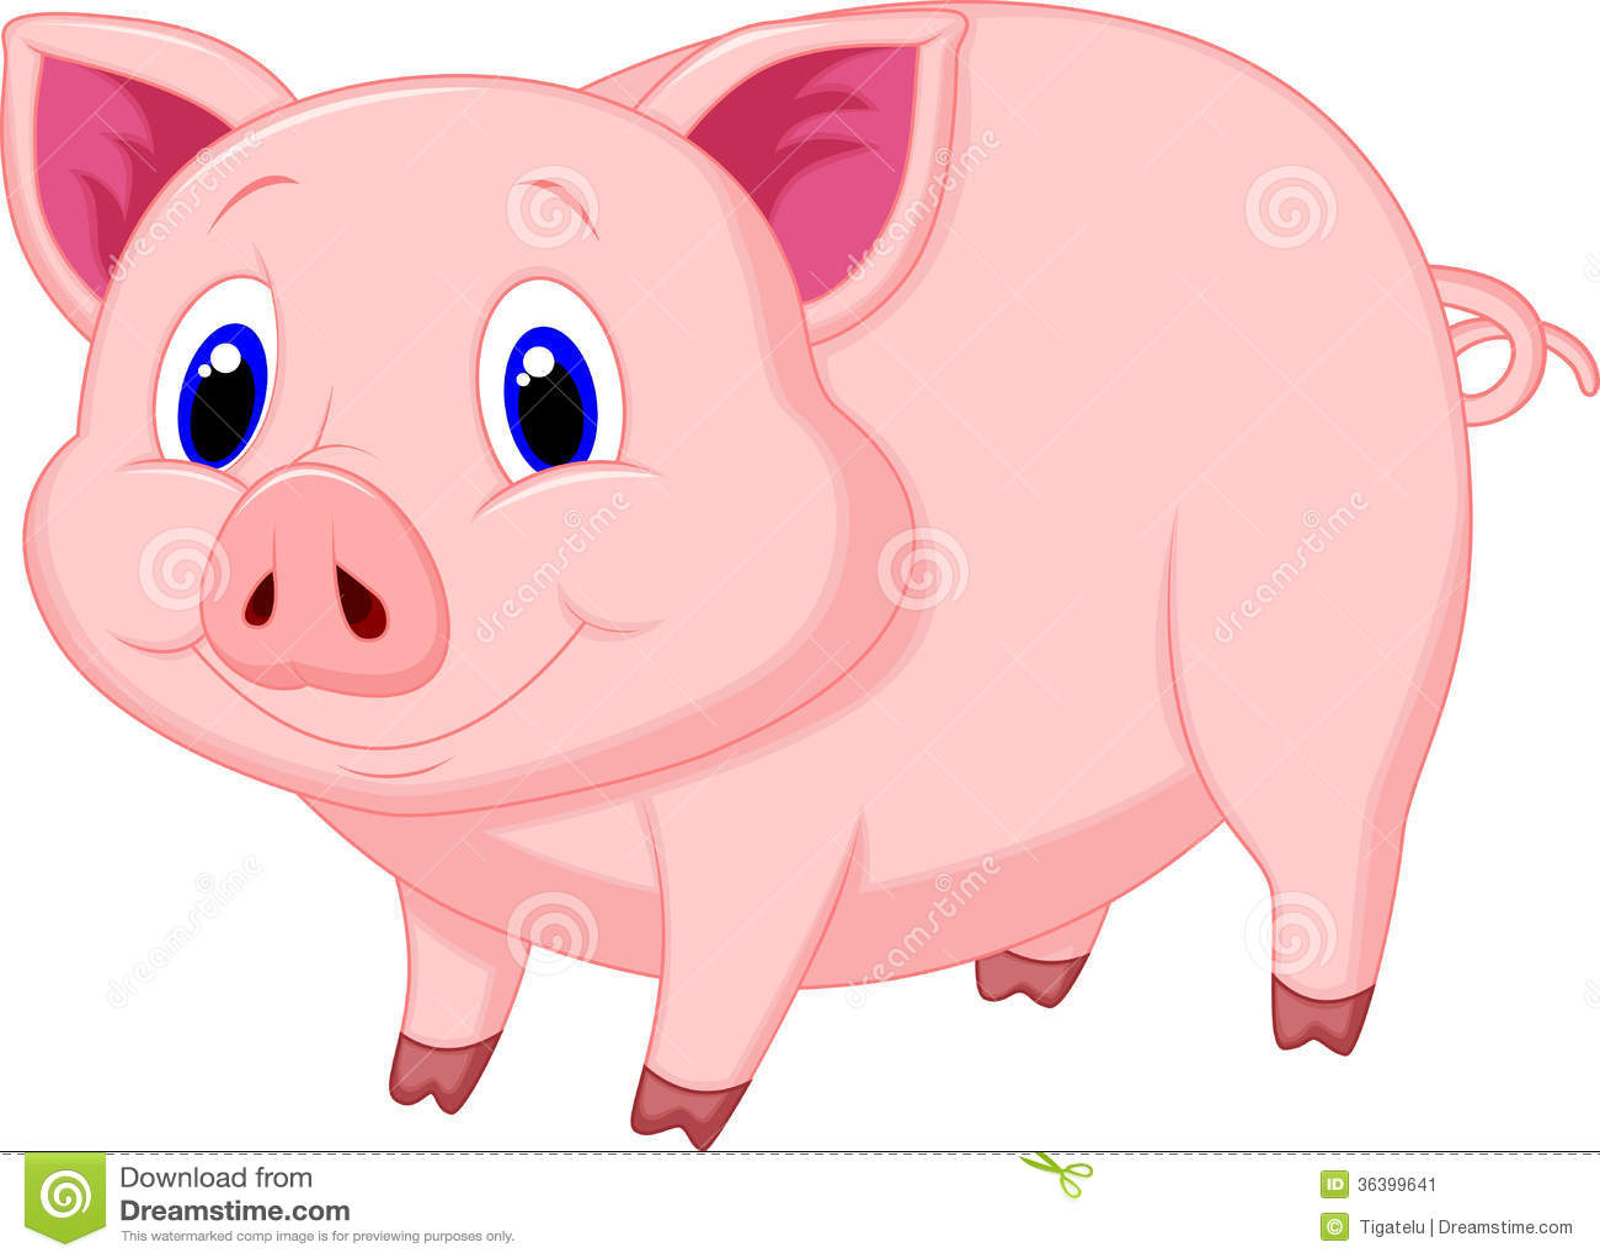 Cute pig cartoon stock vector illustration of doodle - Pig wallpaper cartoon pig ...